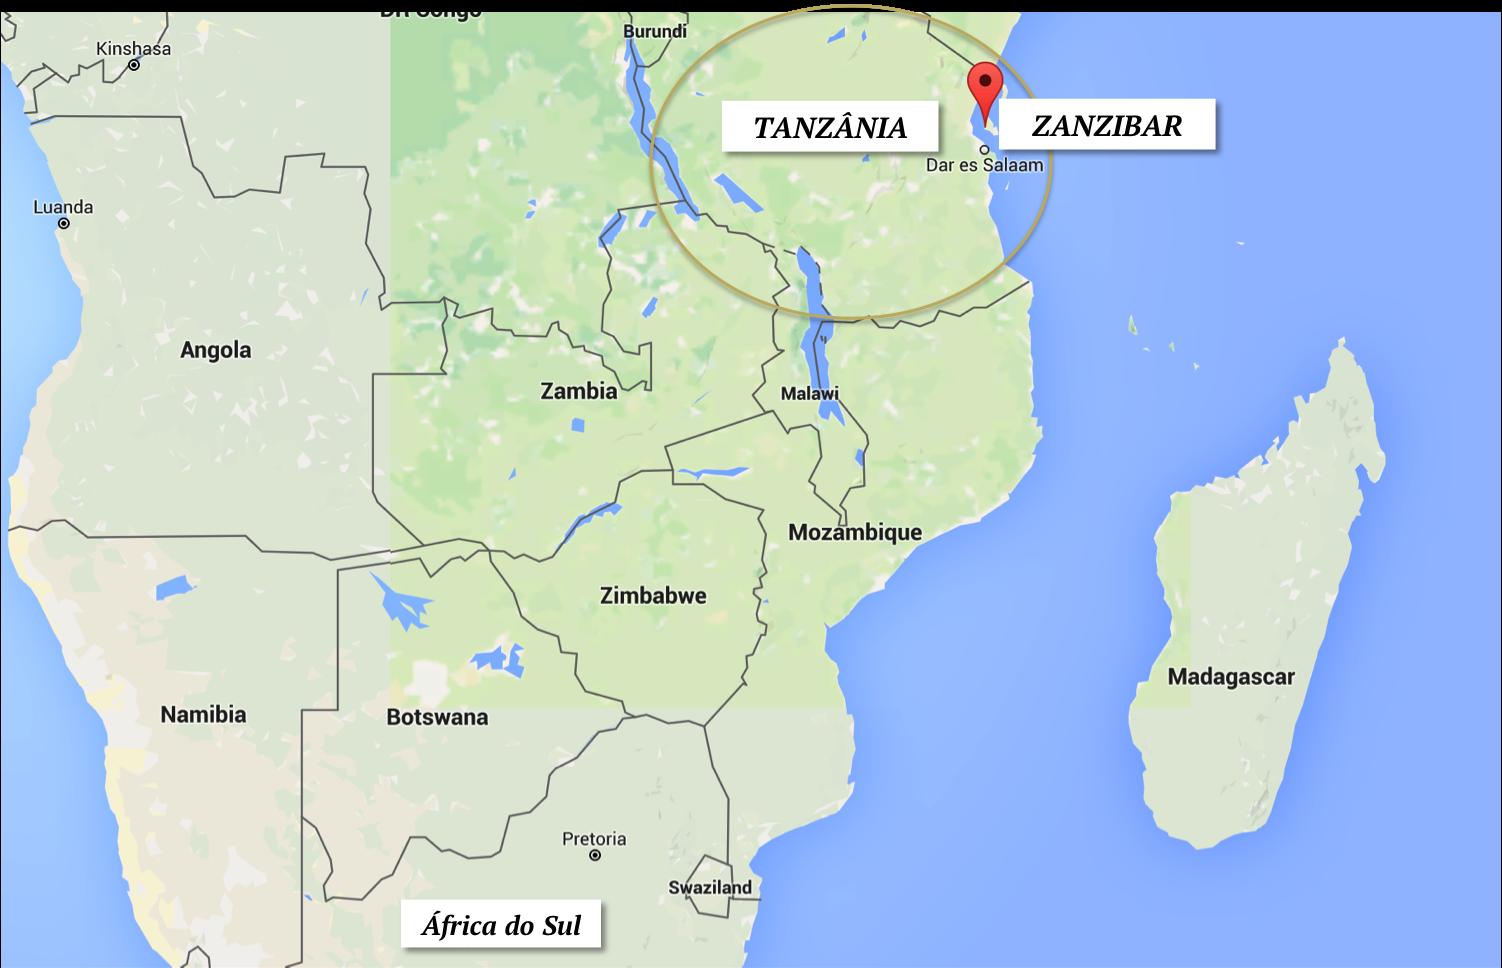 dicas de zanzibar onde fica localizacao tanzania africa do sul